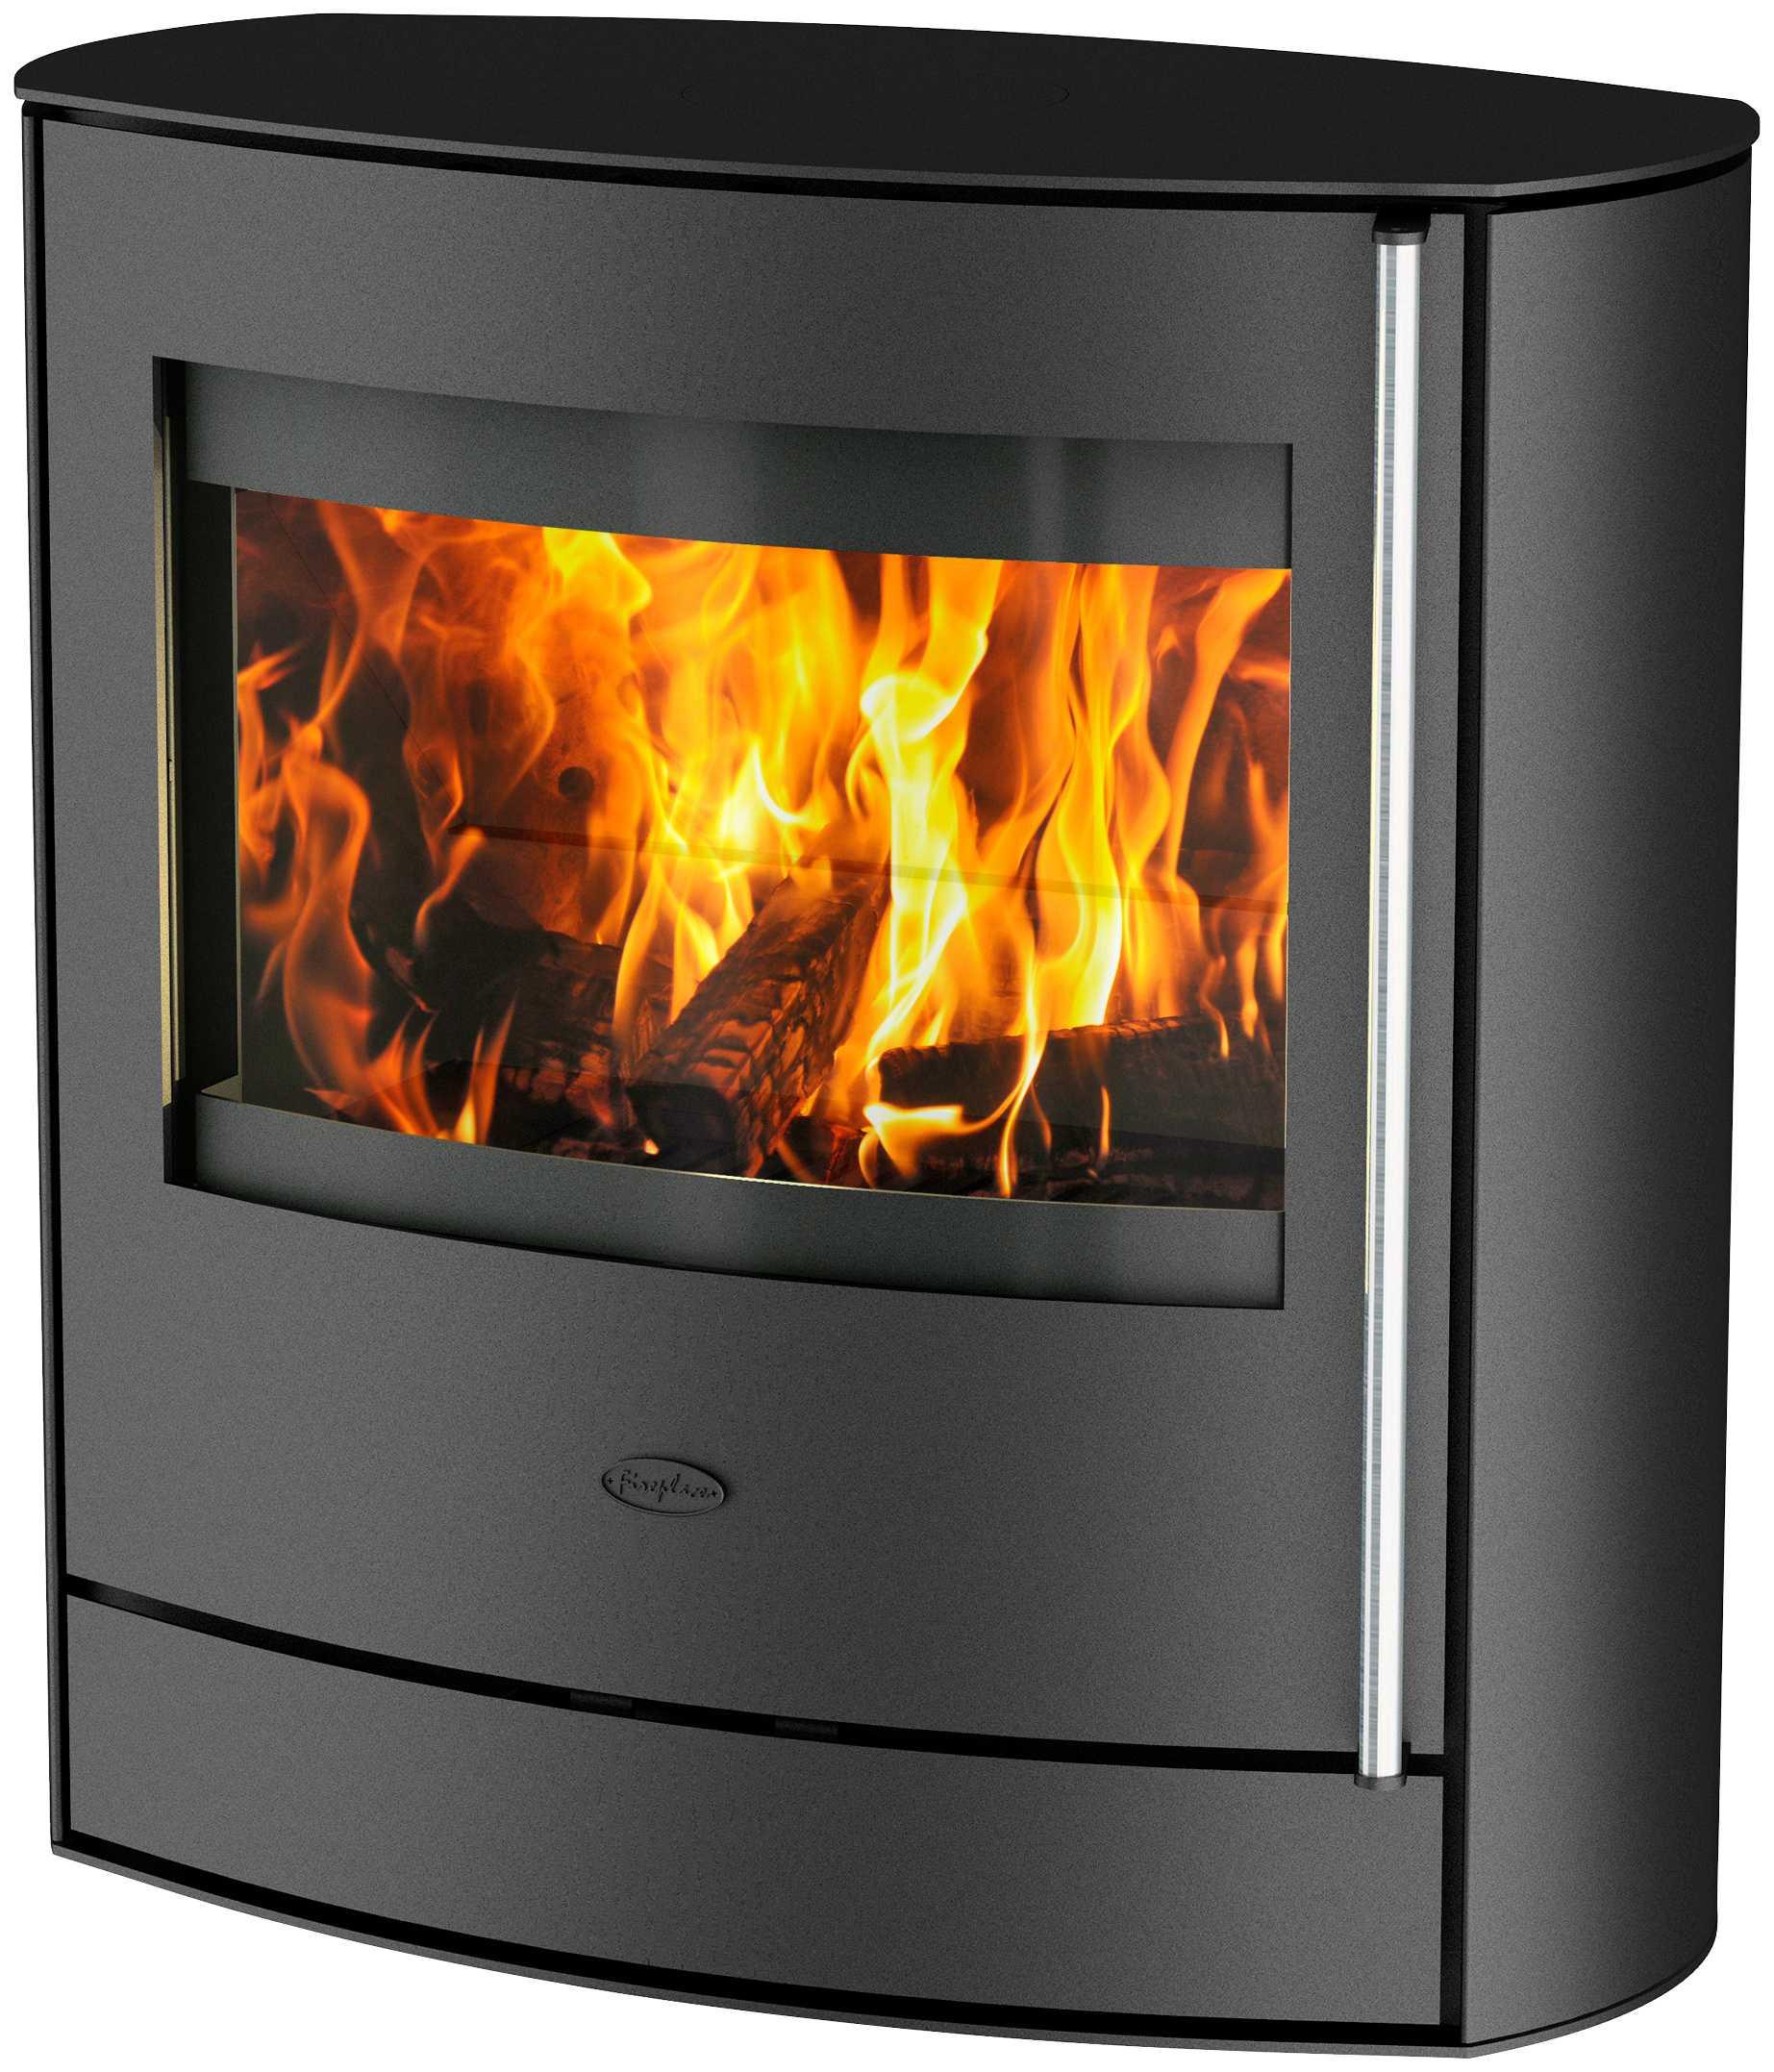 Hervorragend Fireplace ADAMIS Stahl Kaminofen 7 kW - Ofenbernd.de DT69